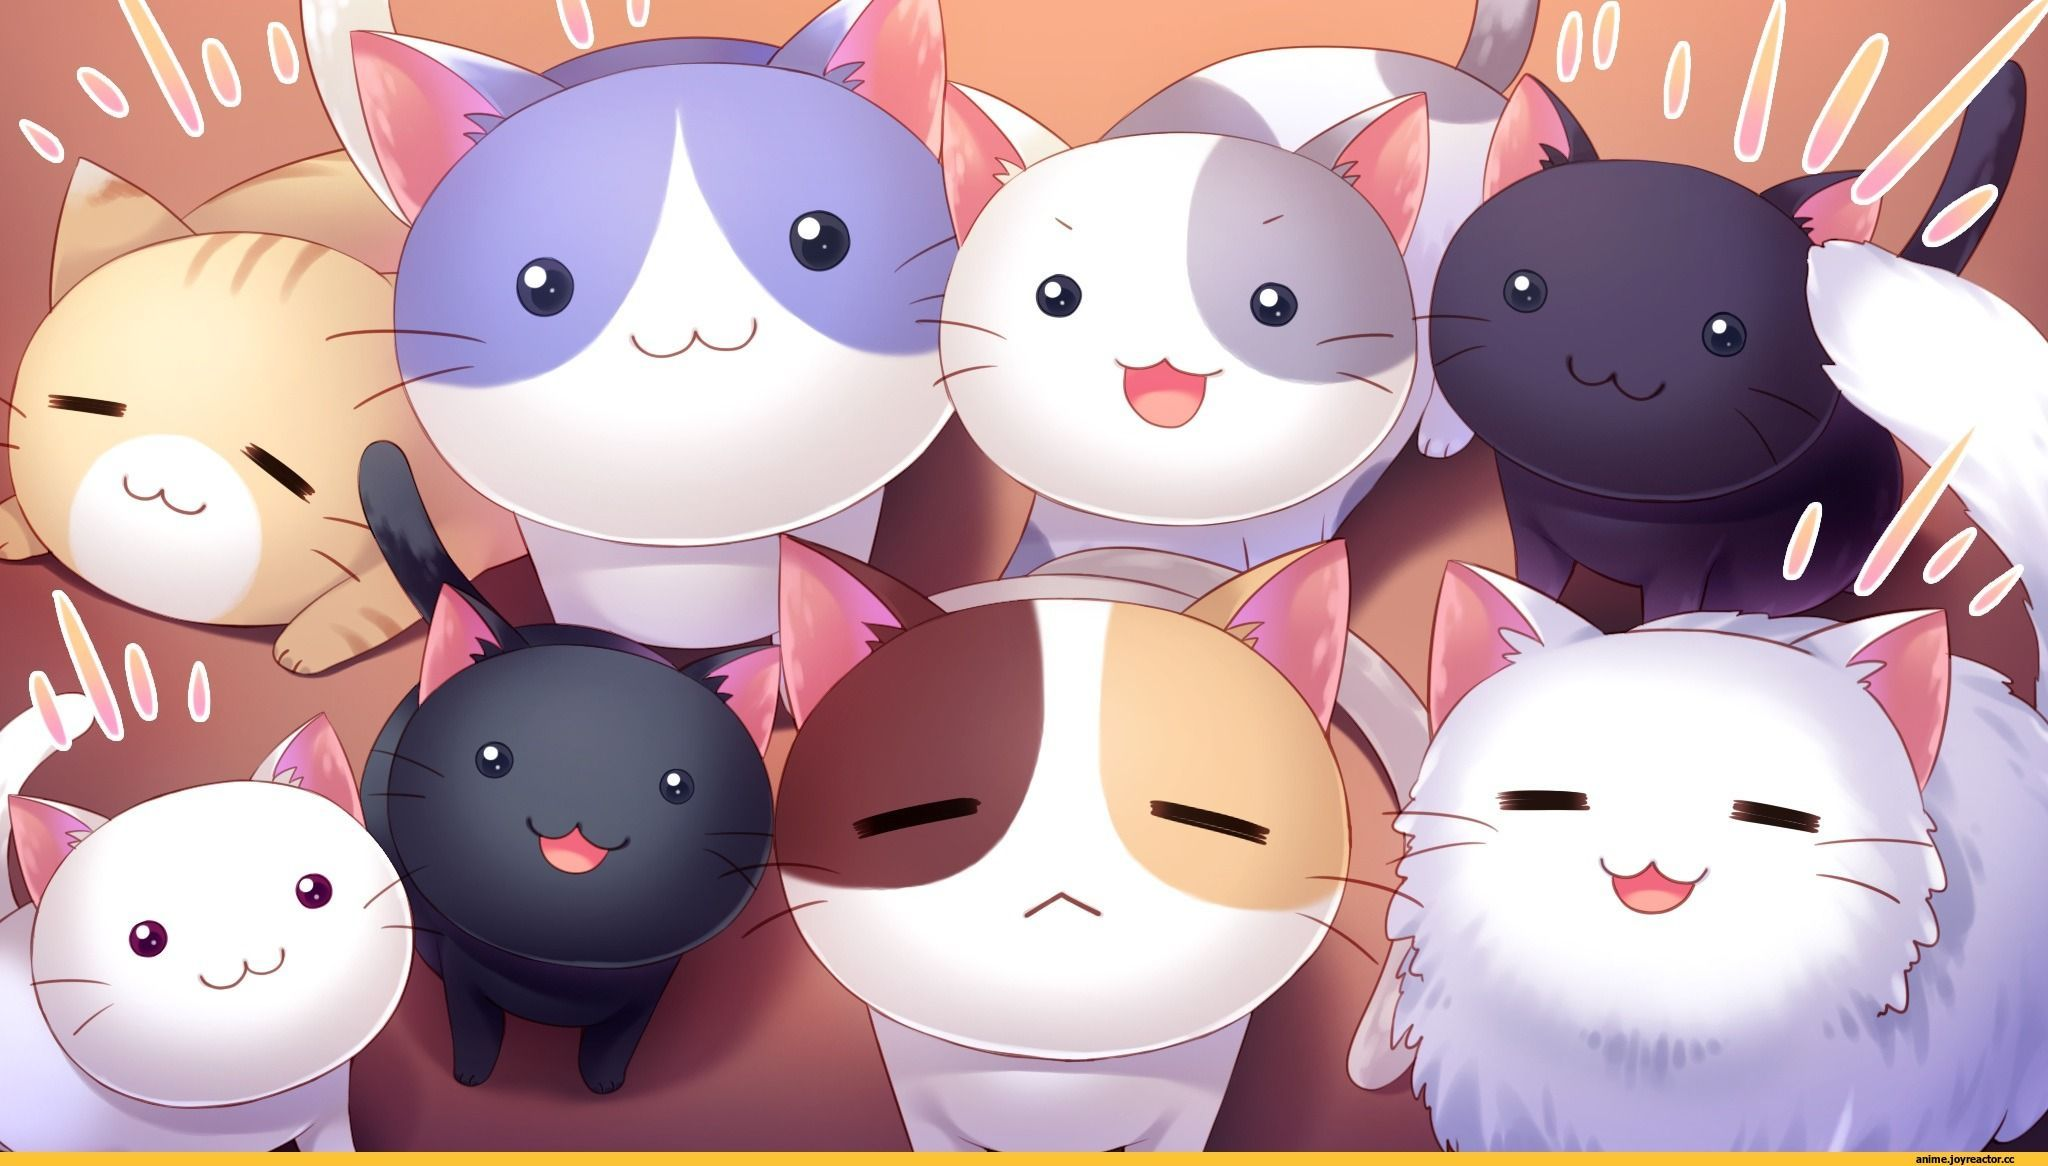 Anime Cute Anime Google Backgrounds Cute Anime Cat Anime Wallpaper Cute Anime Wallpaper